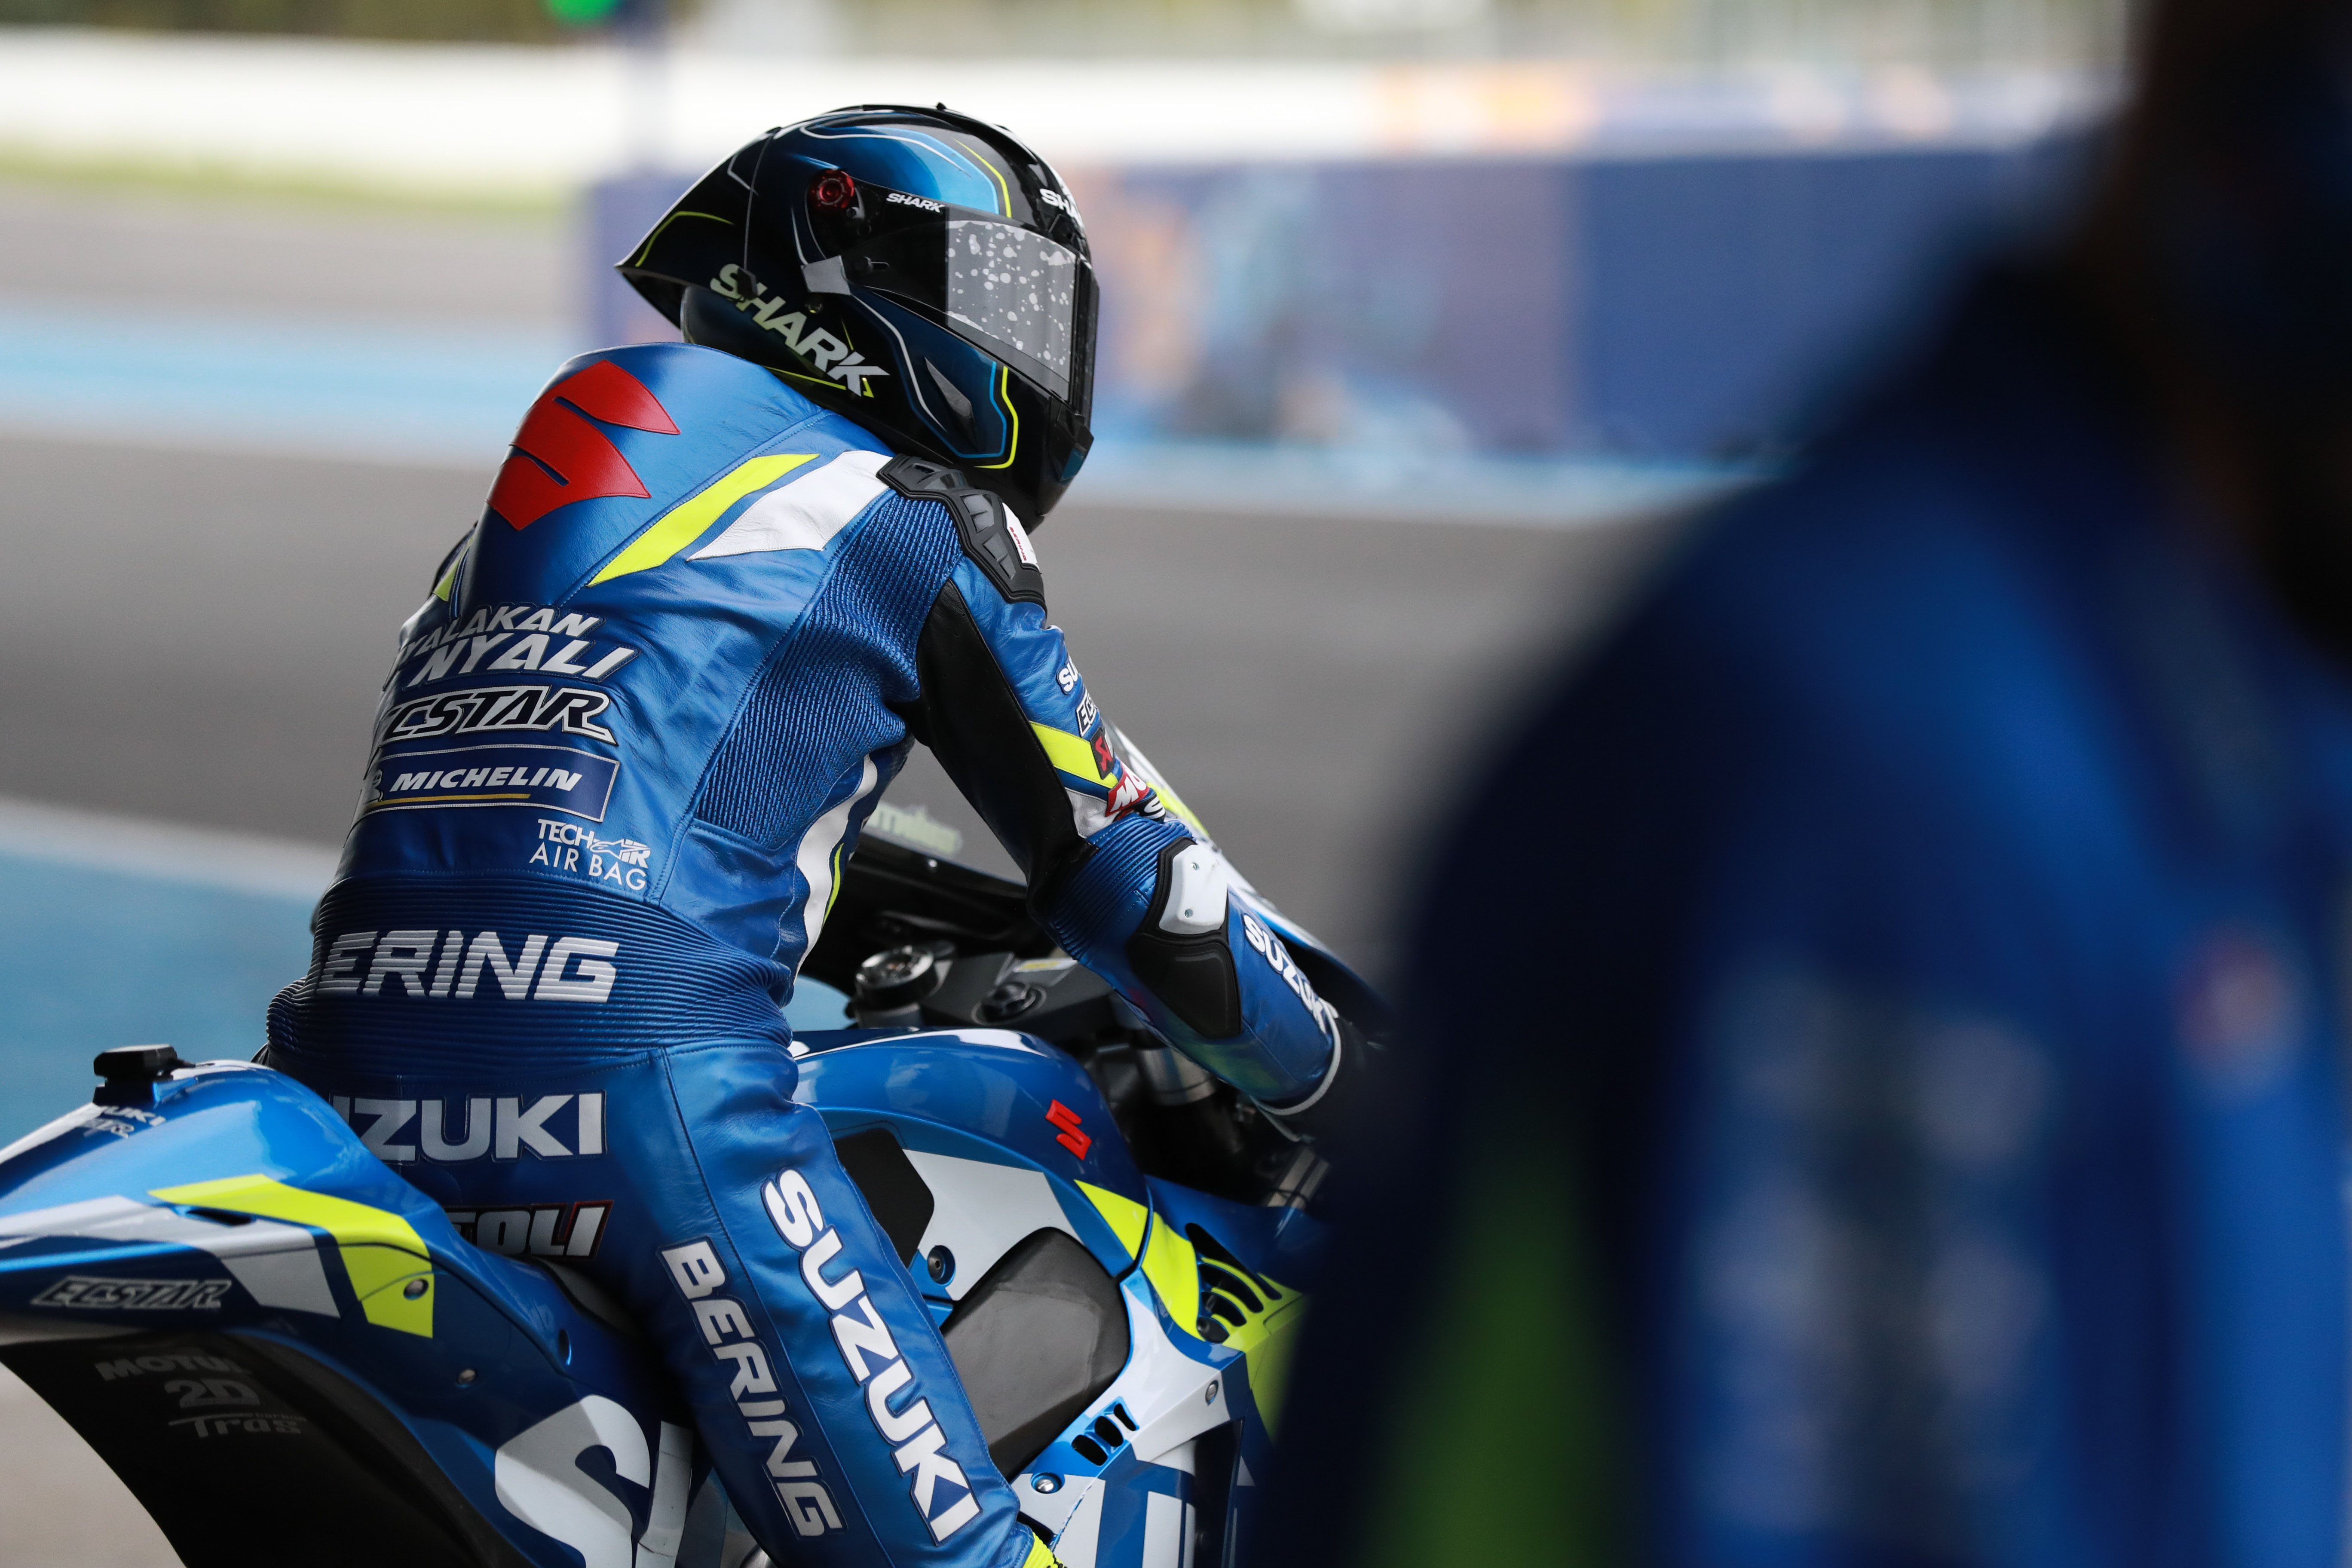 Sylvain Guintoli Suzuki MotoGP test 2020